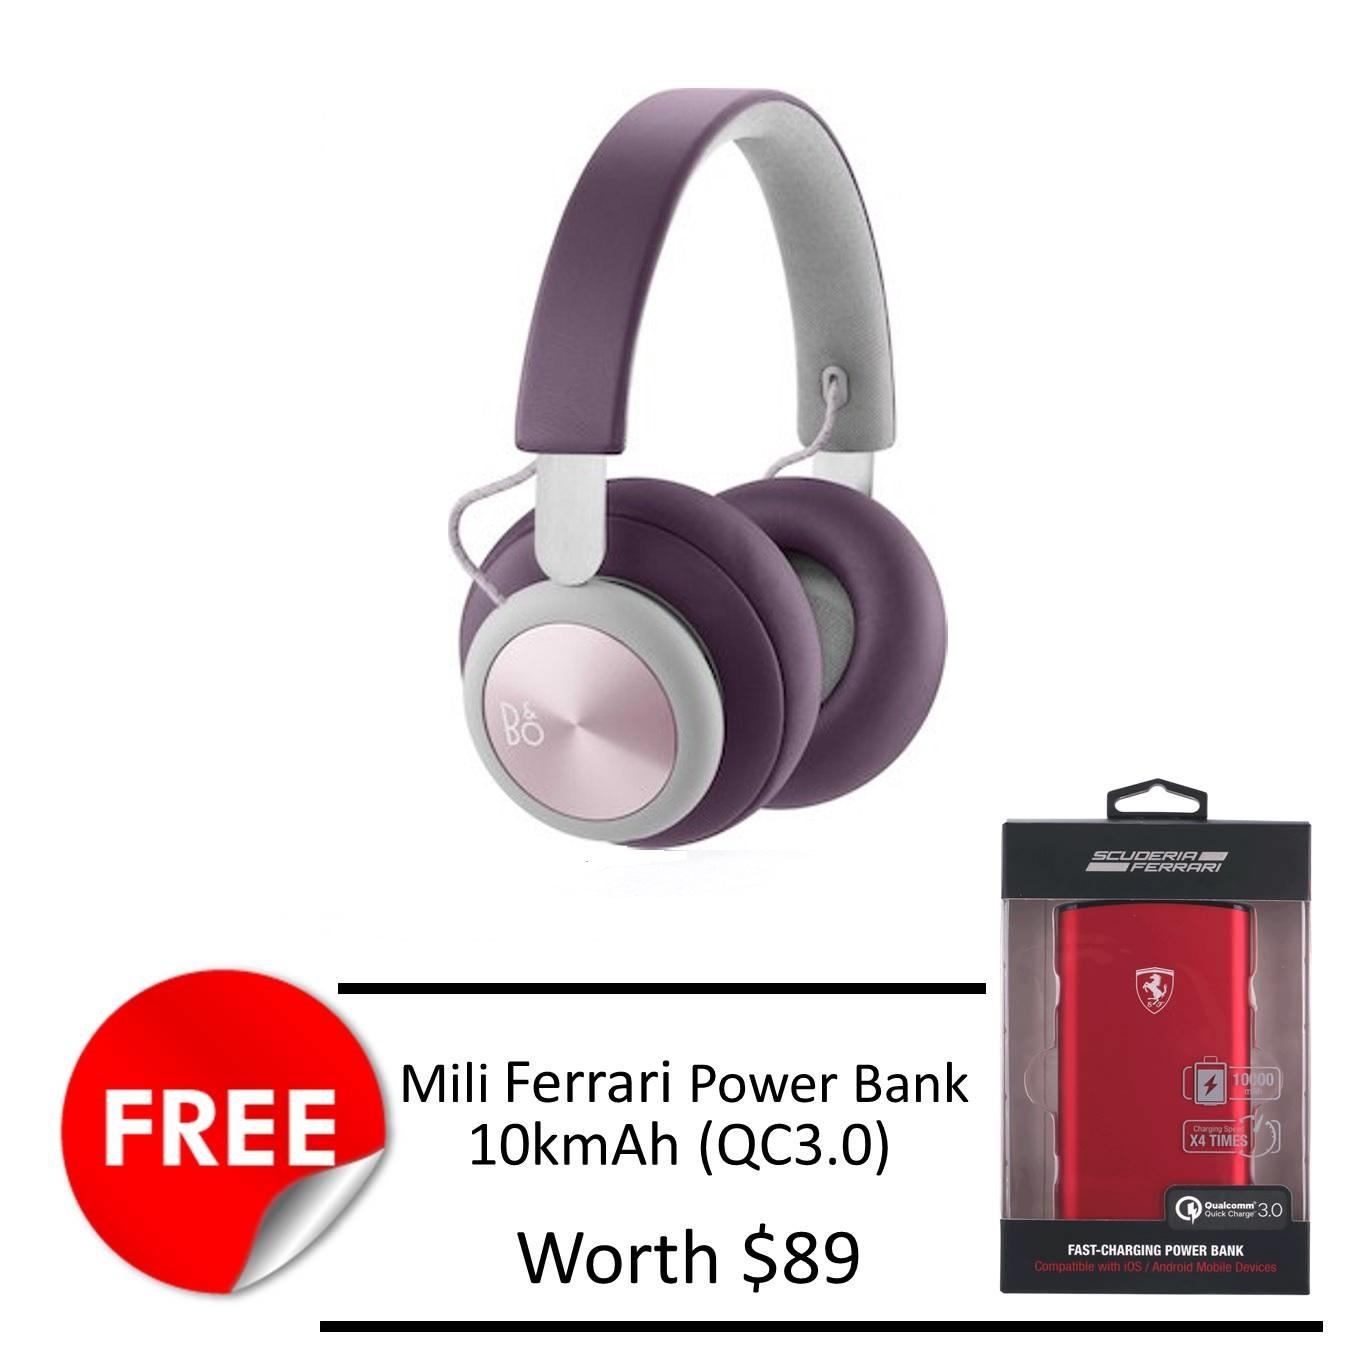 B O Beoplay H4 Wireless Bluetooth Headphone Free Ferrari 10K Mah Powerbank Free Shipping